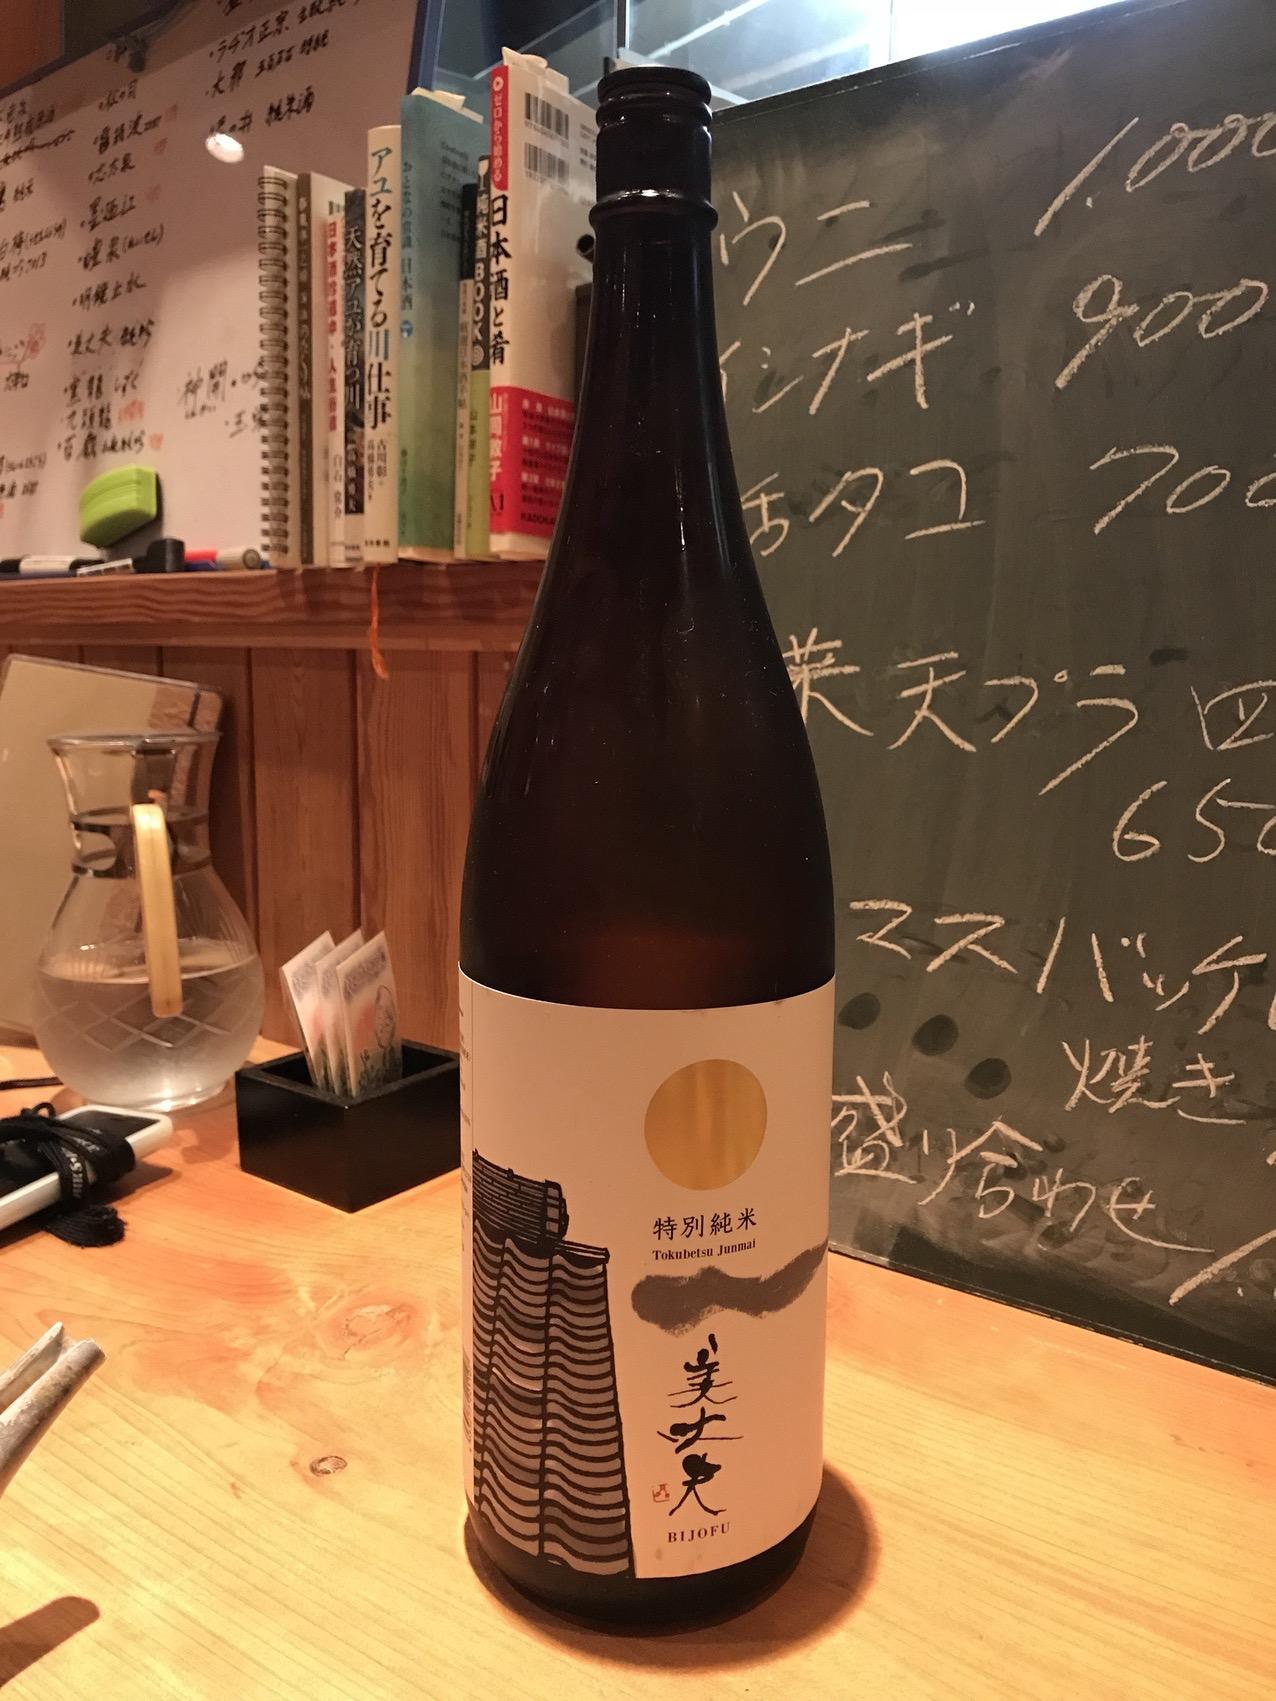 Hirosaki hanaikada 201833